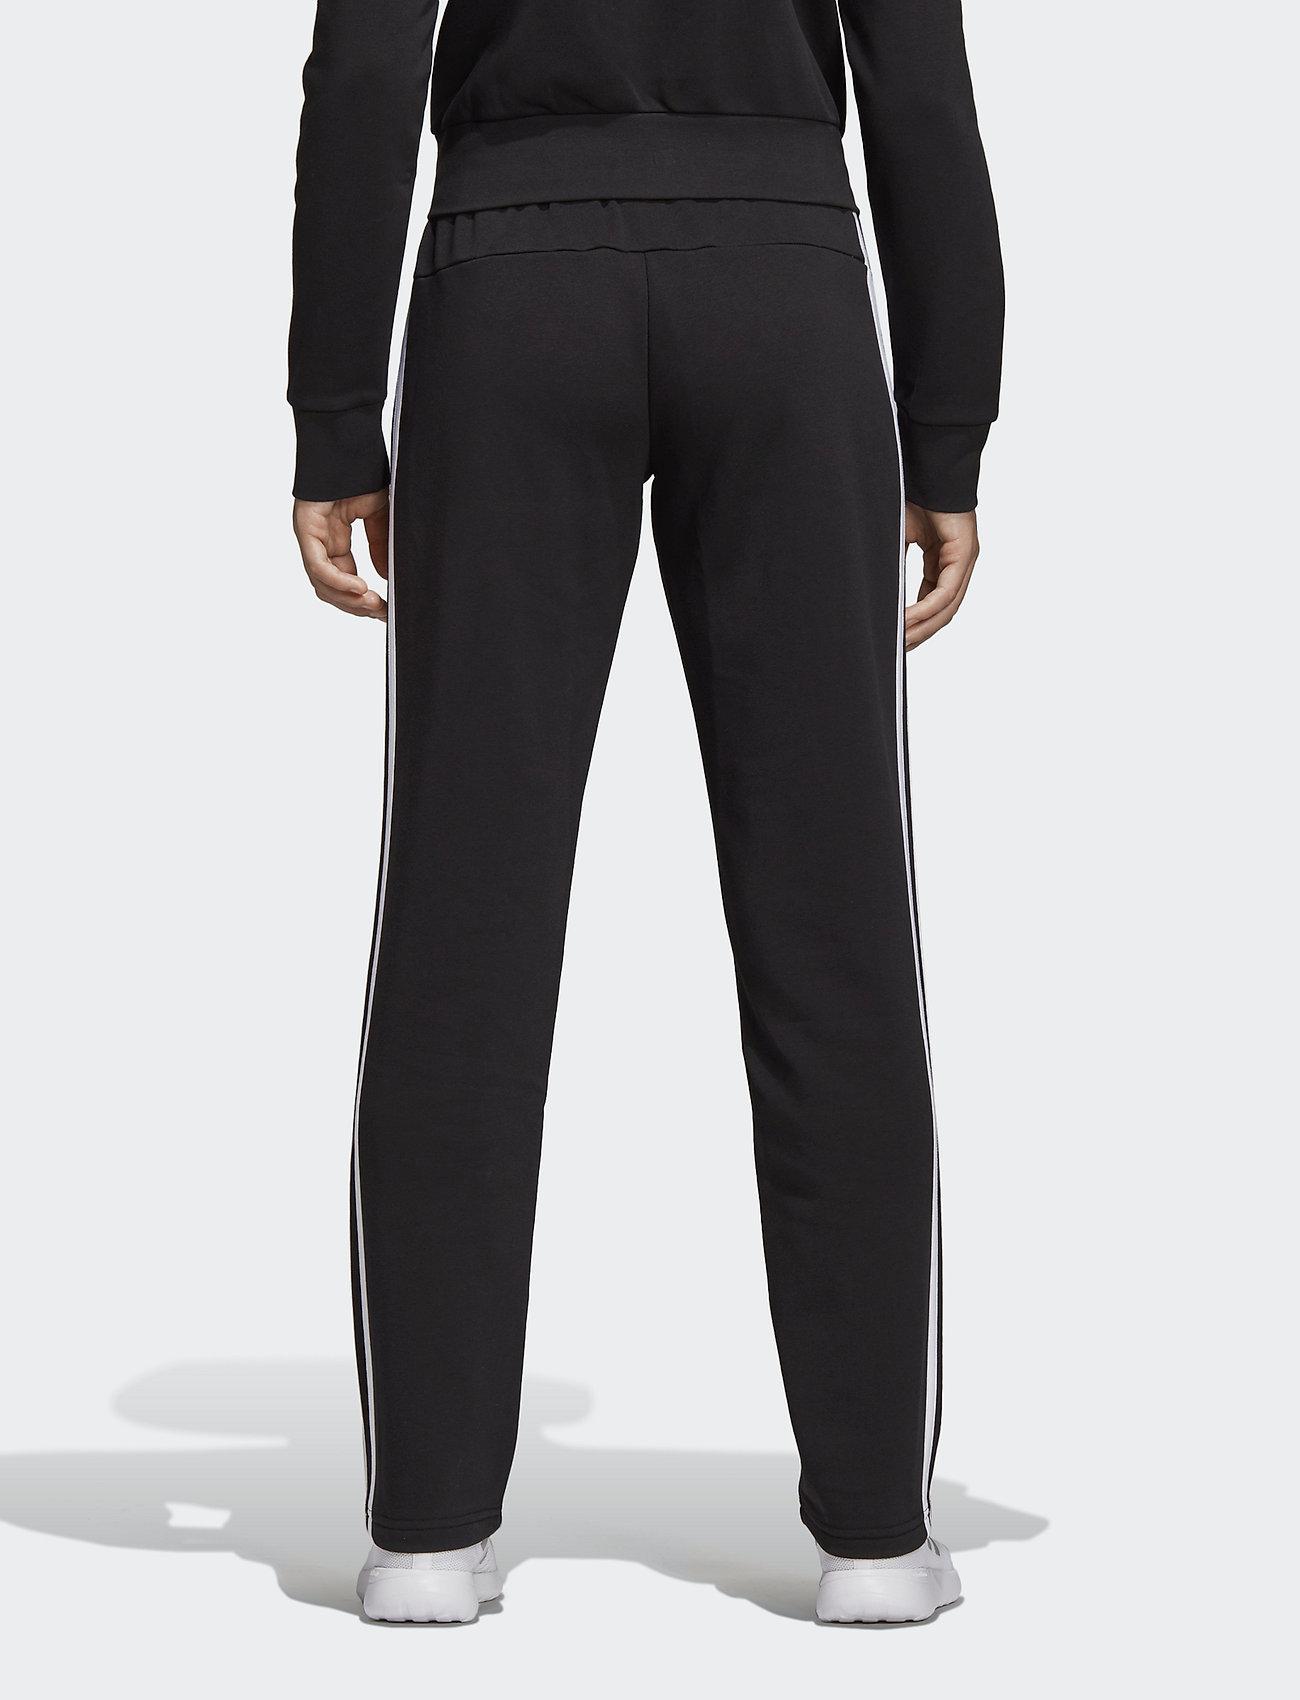 W E 3s Pant Oh (Black/white) (479 kr) - adidas Performance